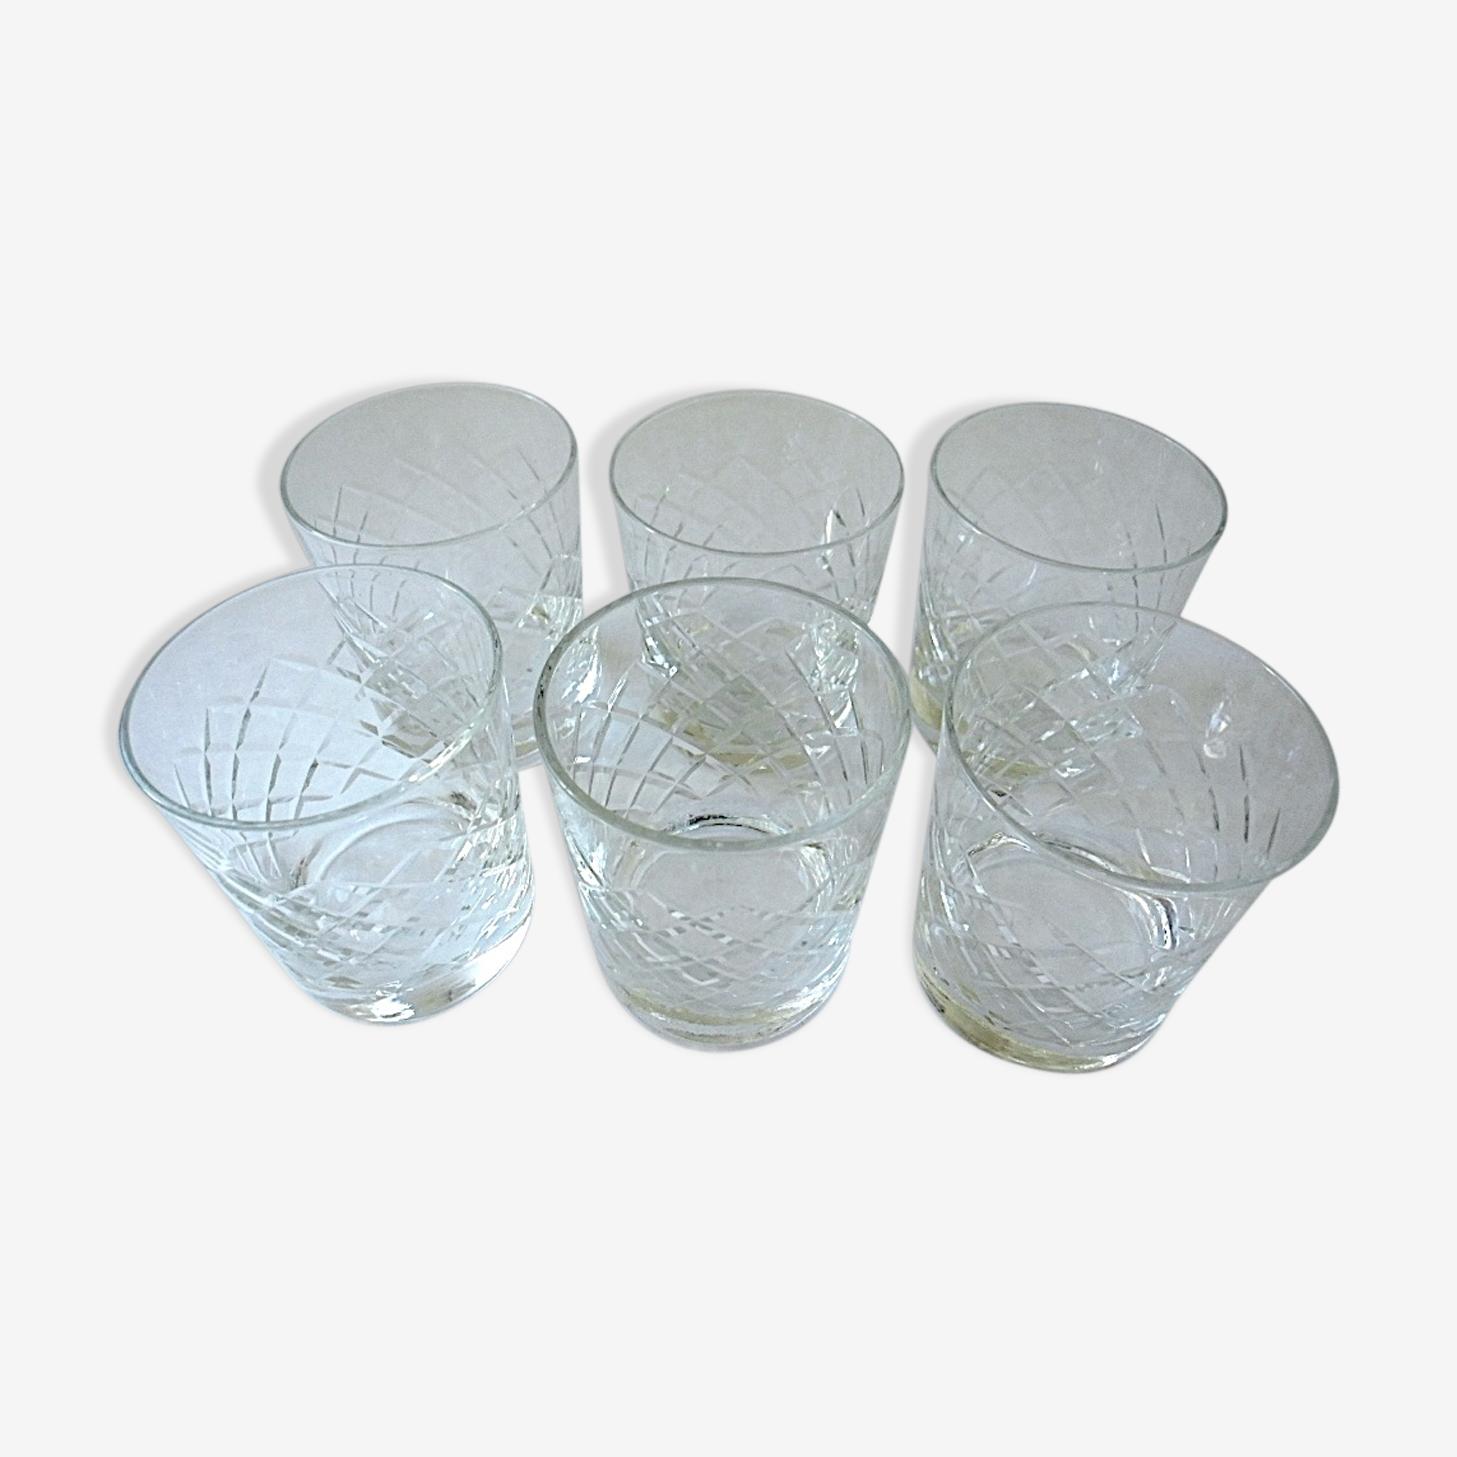 Set of 6 bourbon cups